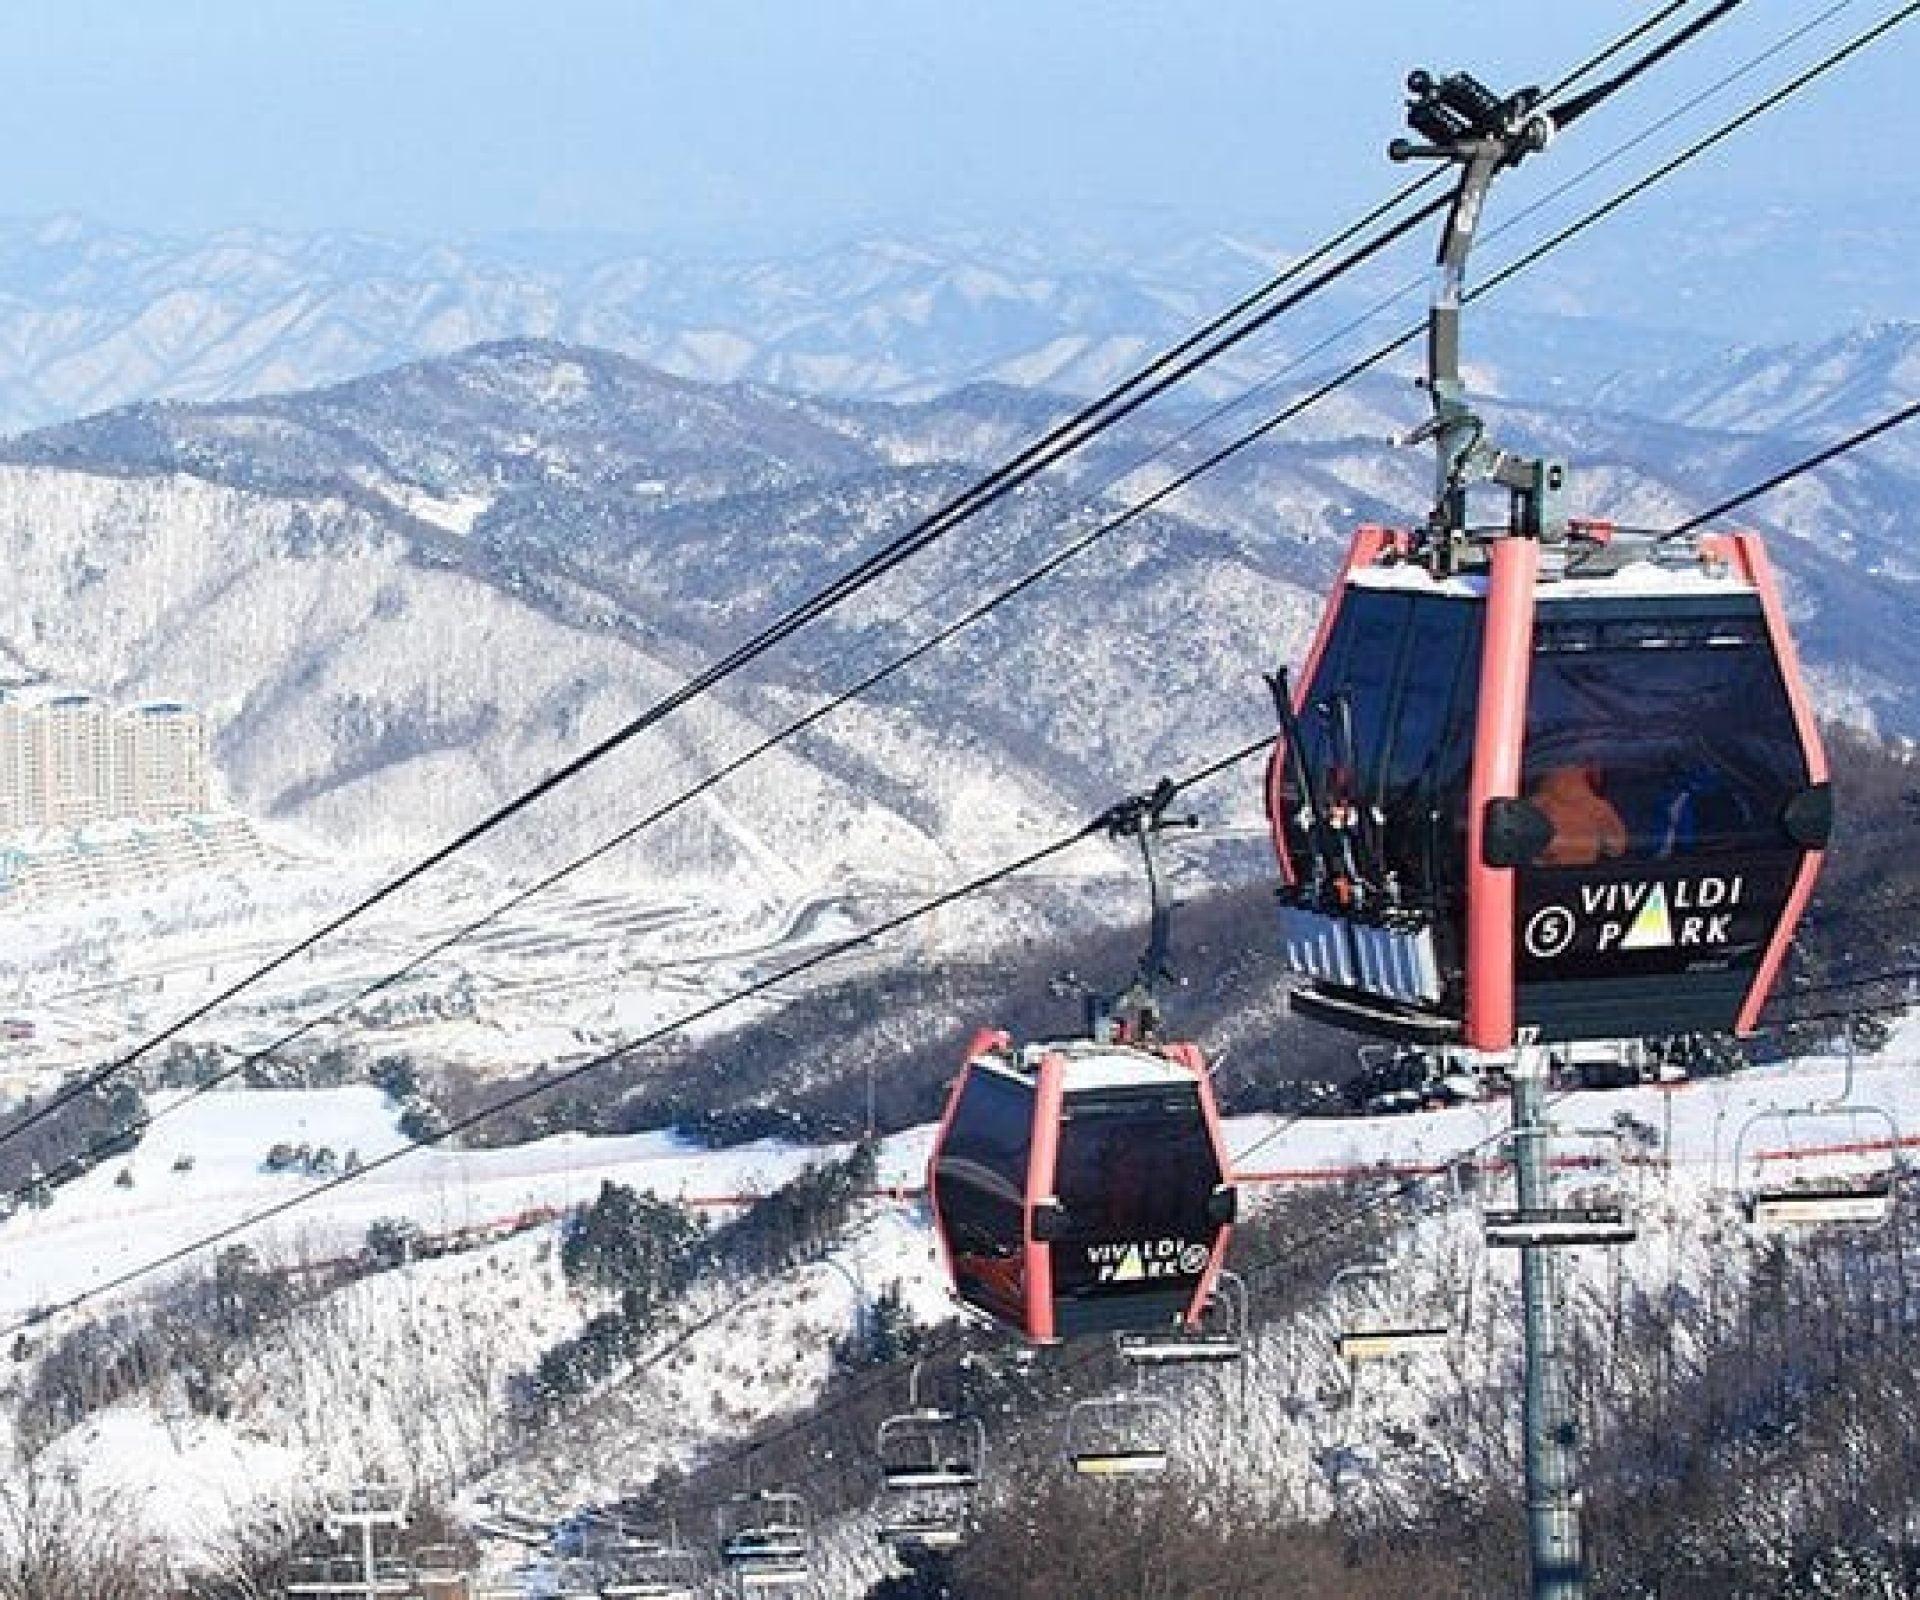 Vivaldi Park Ski Resort | Hongcheon, Gangwon-do